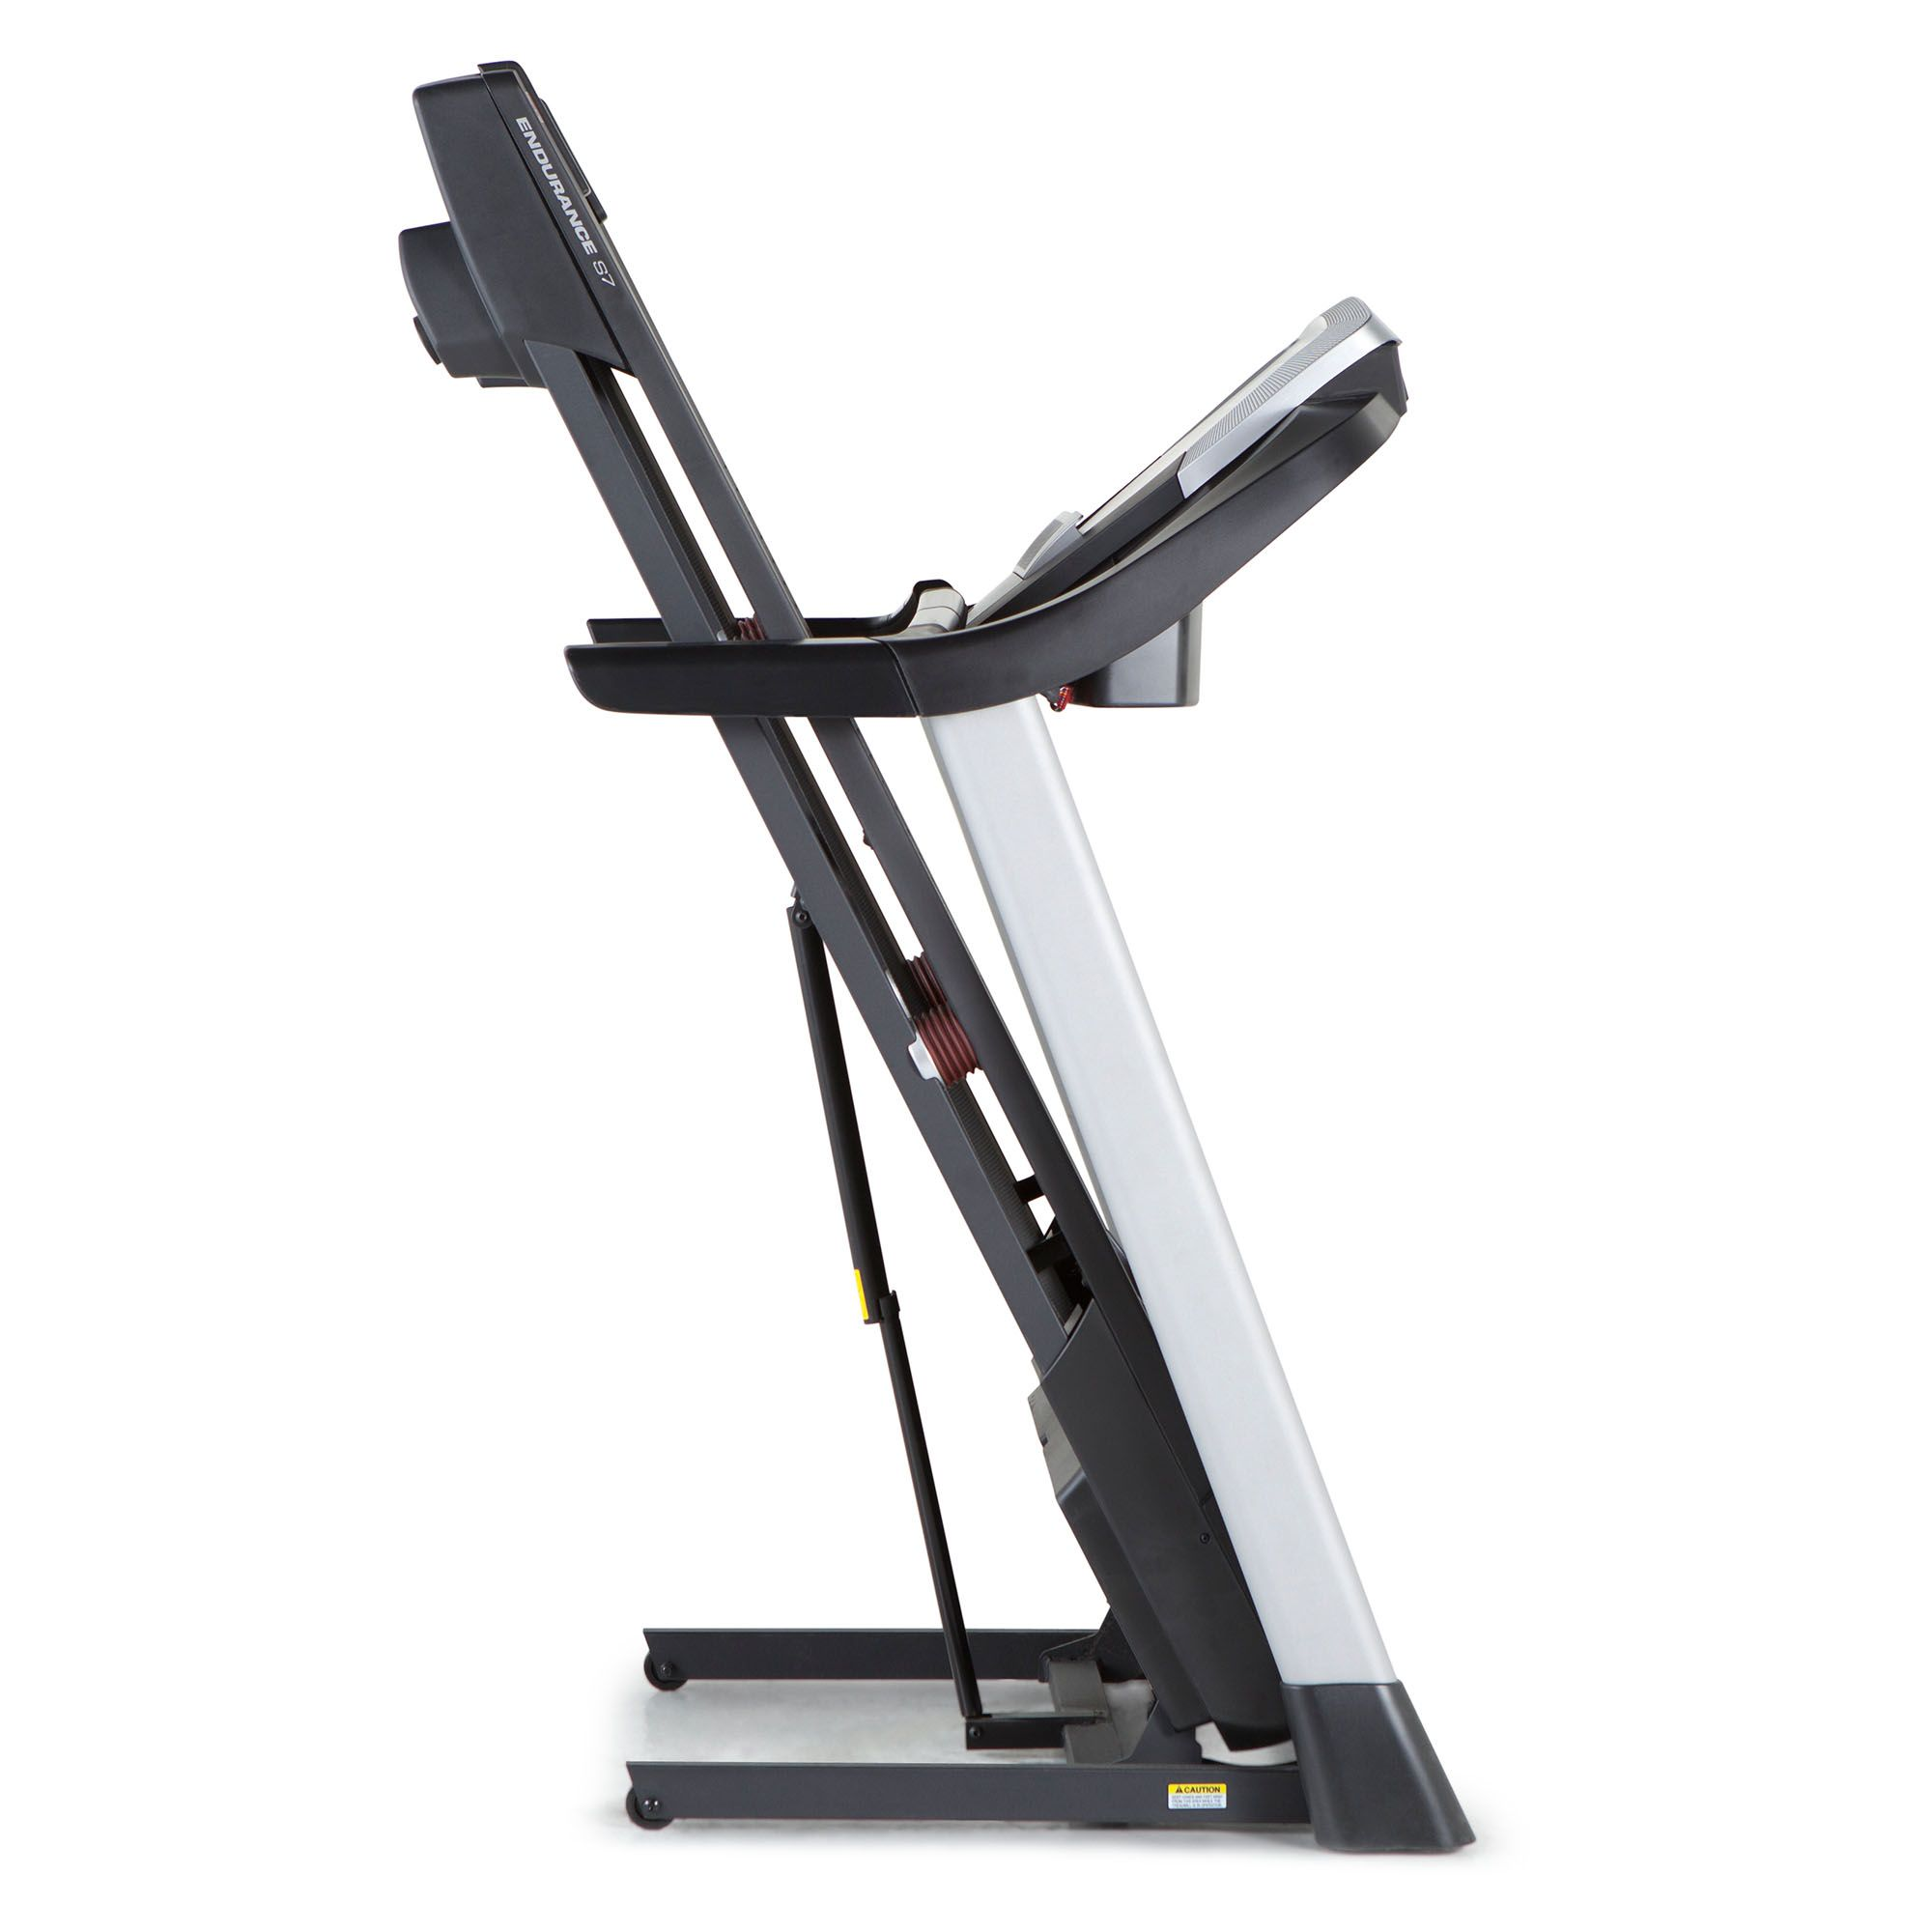 proform endurance s7 treadmill. Black Bedroom Furniture Sets. Home Design Ideas